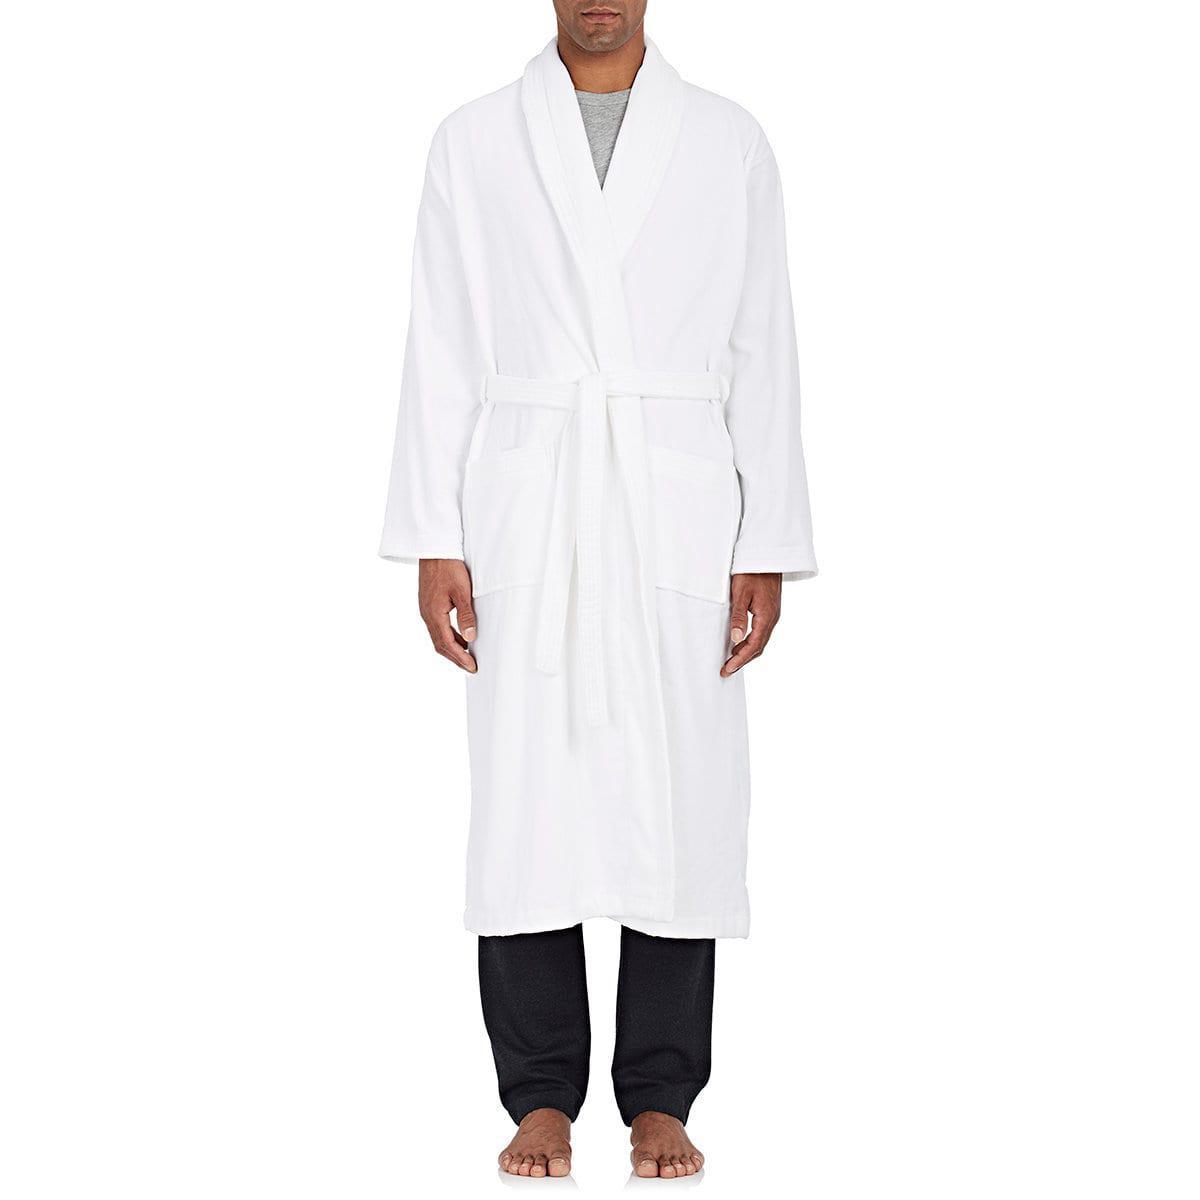 Lyst - Derek Rose Triton Cotton French Terry Velour Robe in White ... c43c07c2f